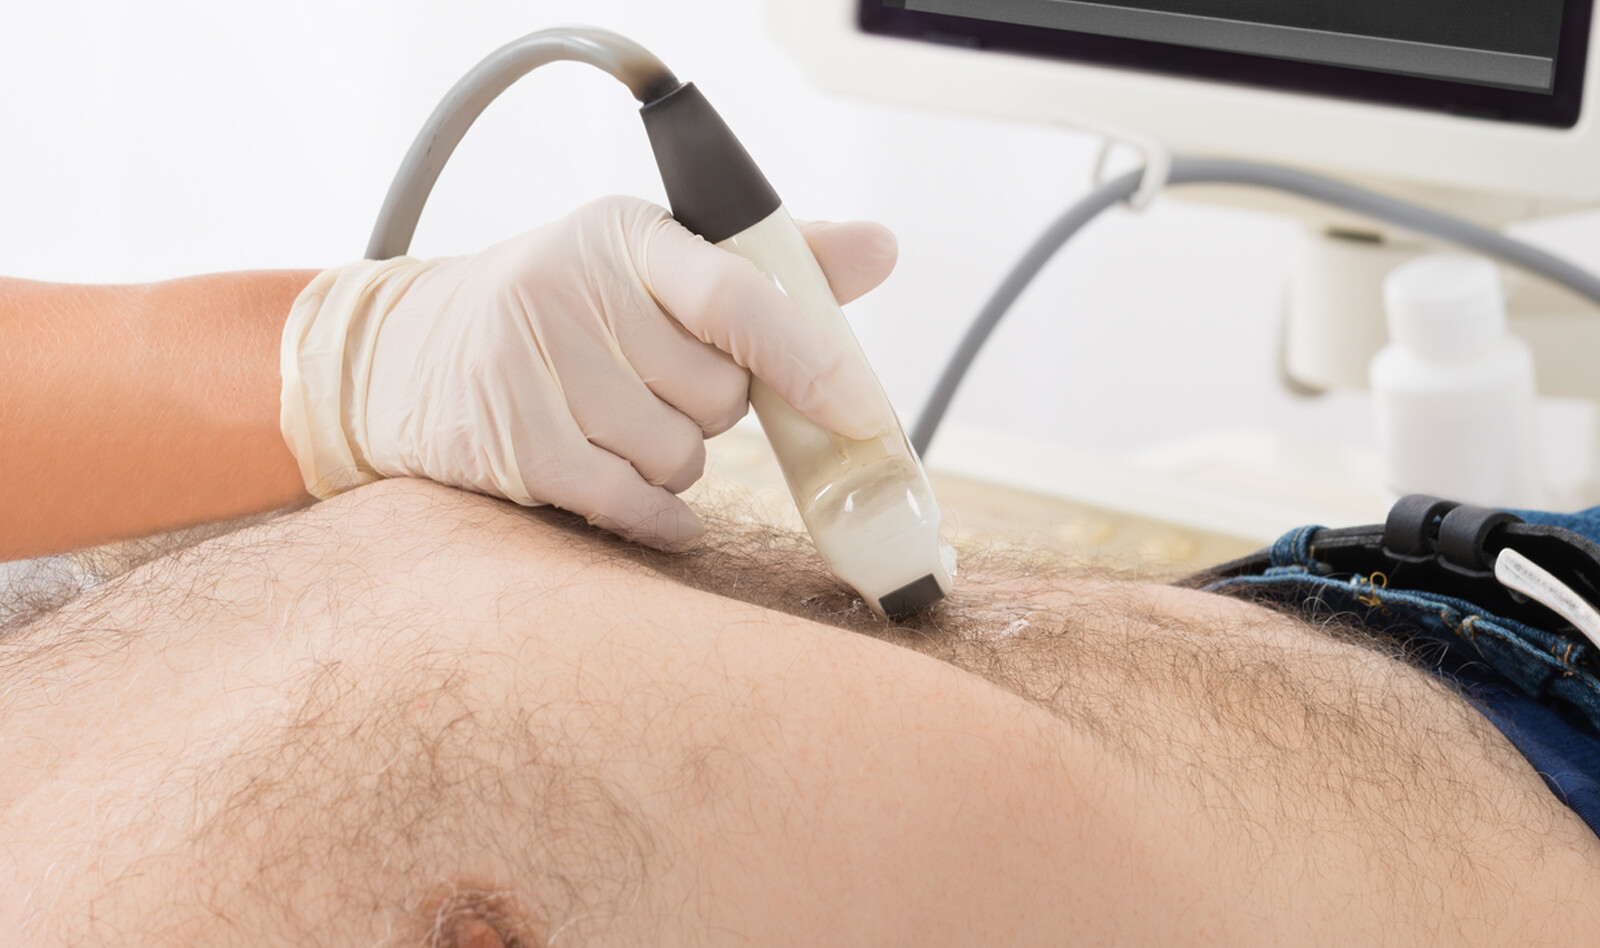 Image of RADUS PoCUS emergency ultrasound Acute Cholecystitis    Online PoCUS Training